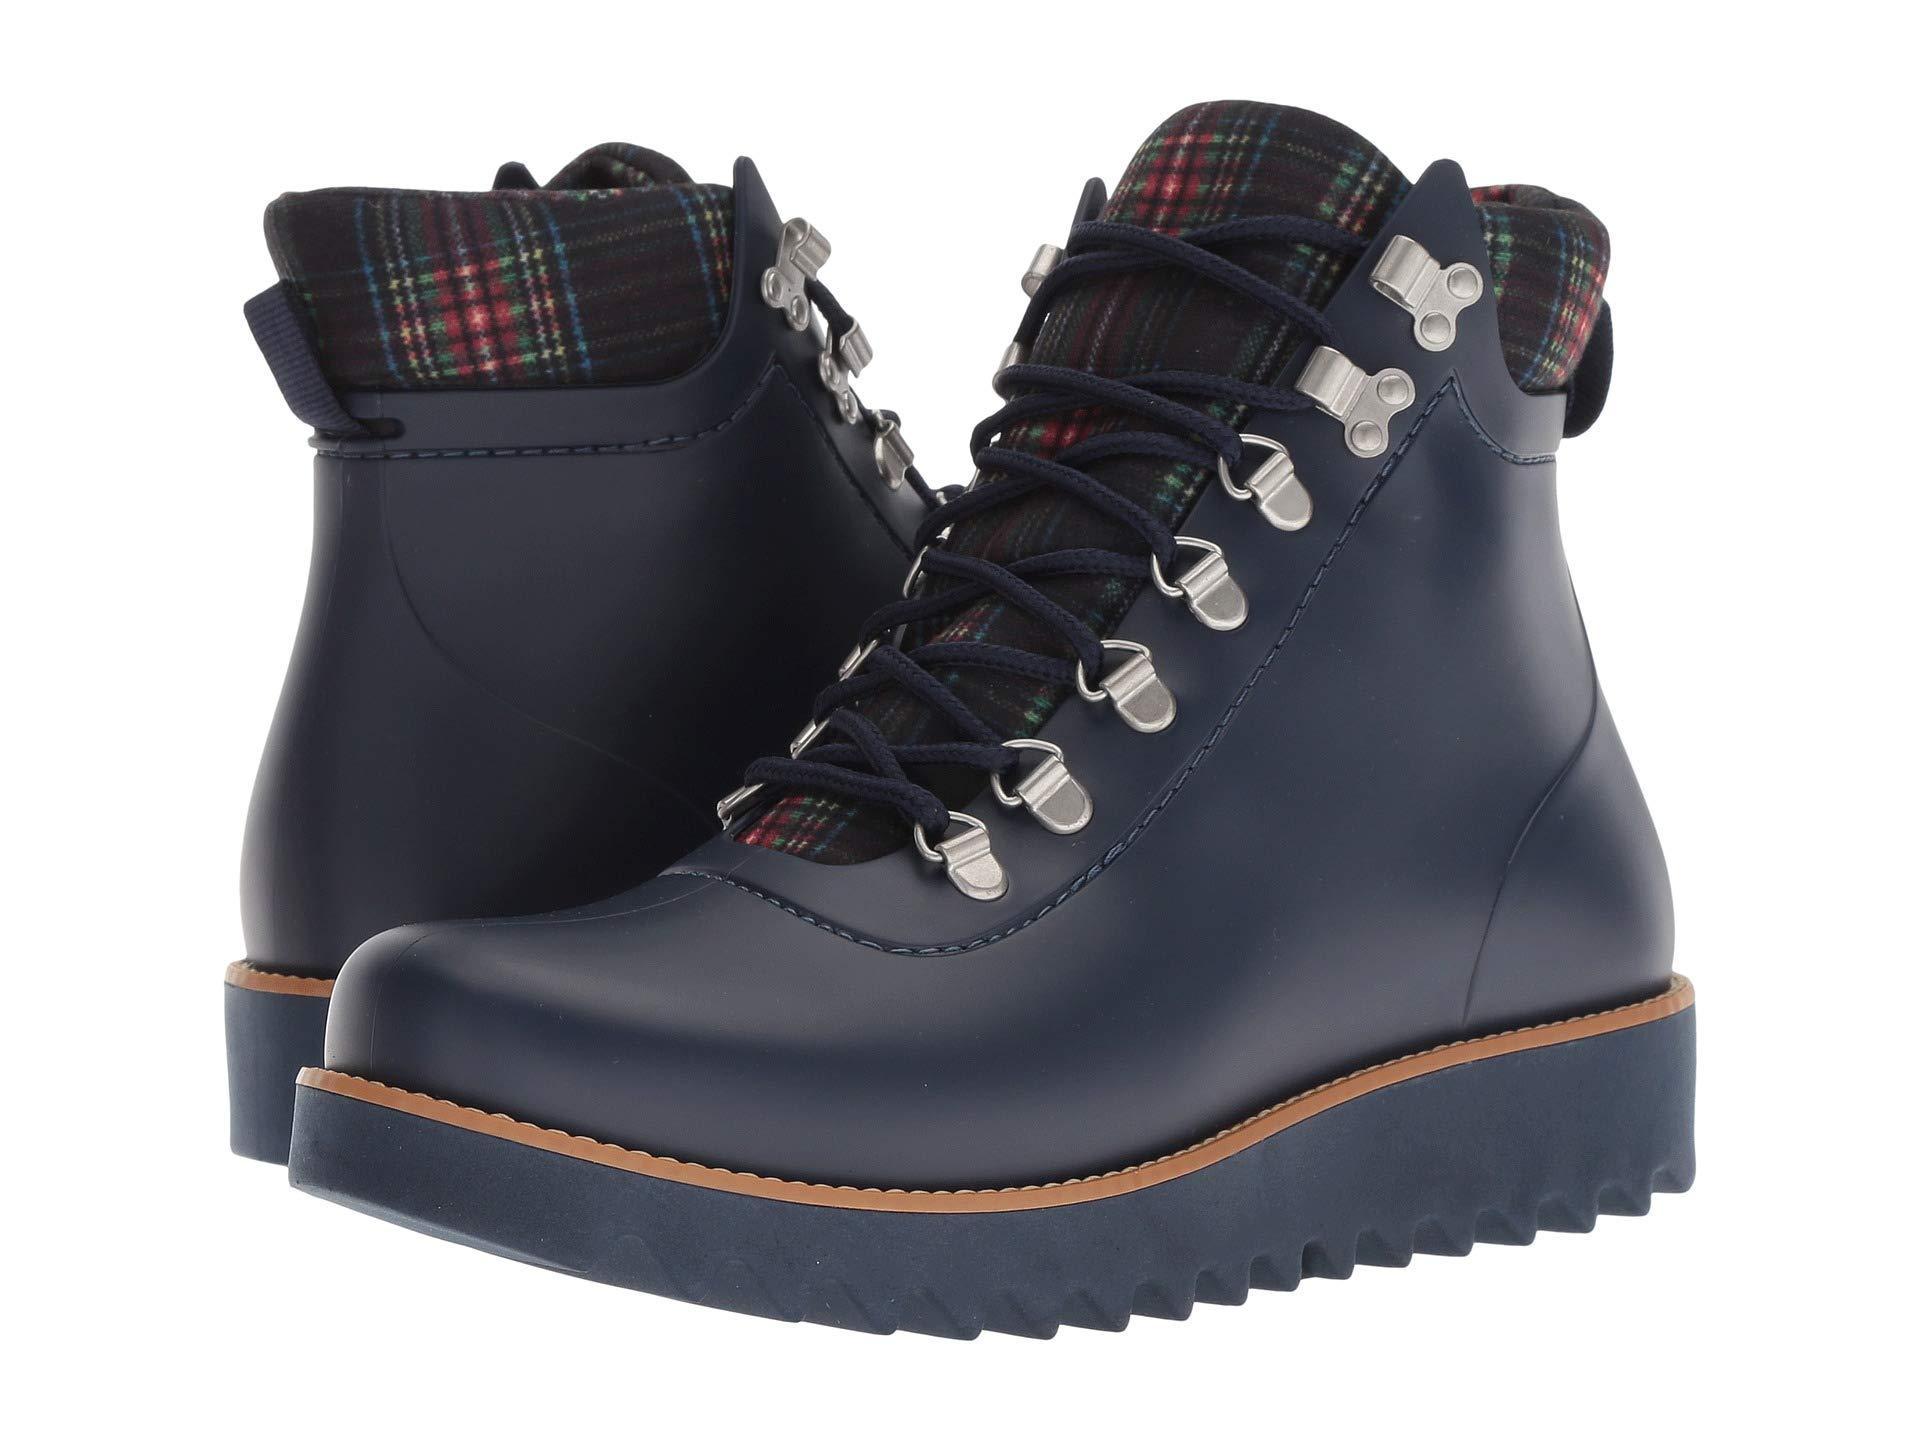 c327ea3de39363 Lyst - Bernardo Winnie Hiker Rain Boot (military Rubber plaid ...